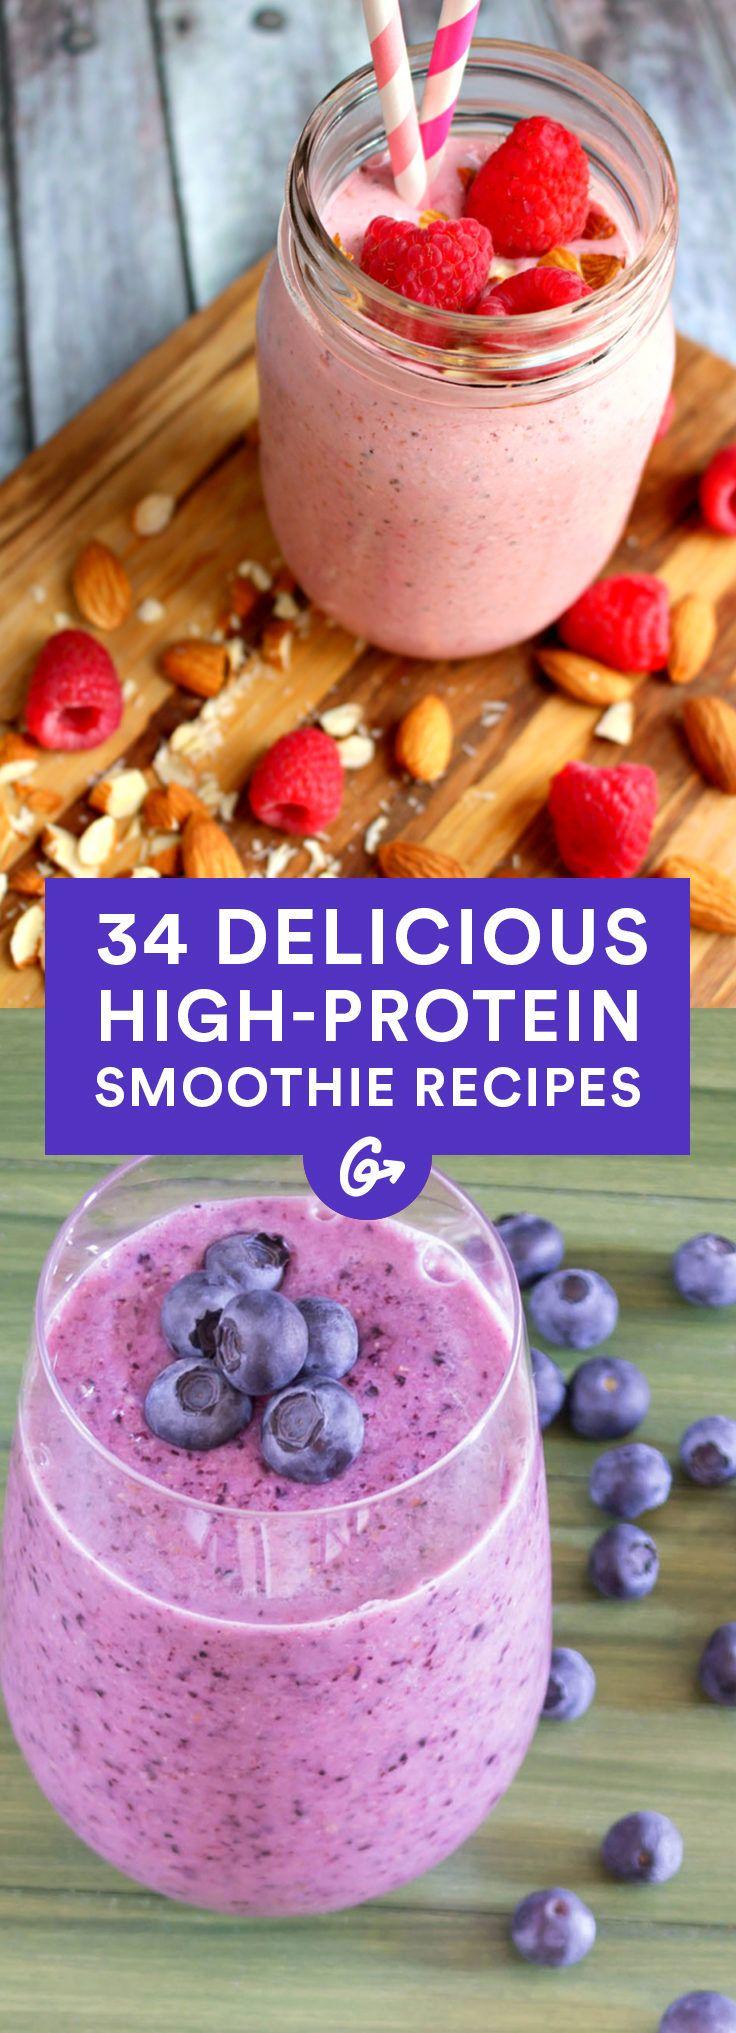 about Recipes: Smoothies on Pinterest | Smoothies, Freezer smoothie ...